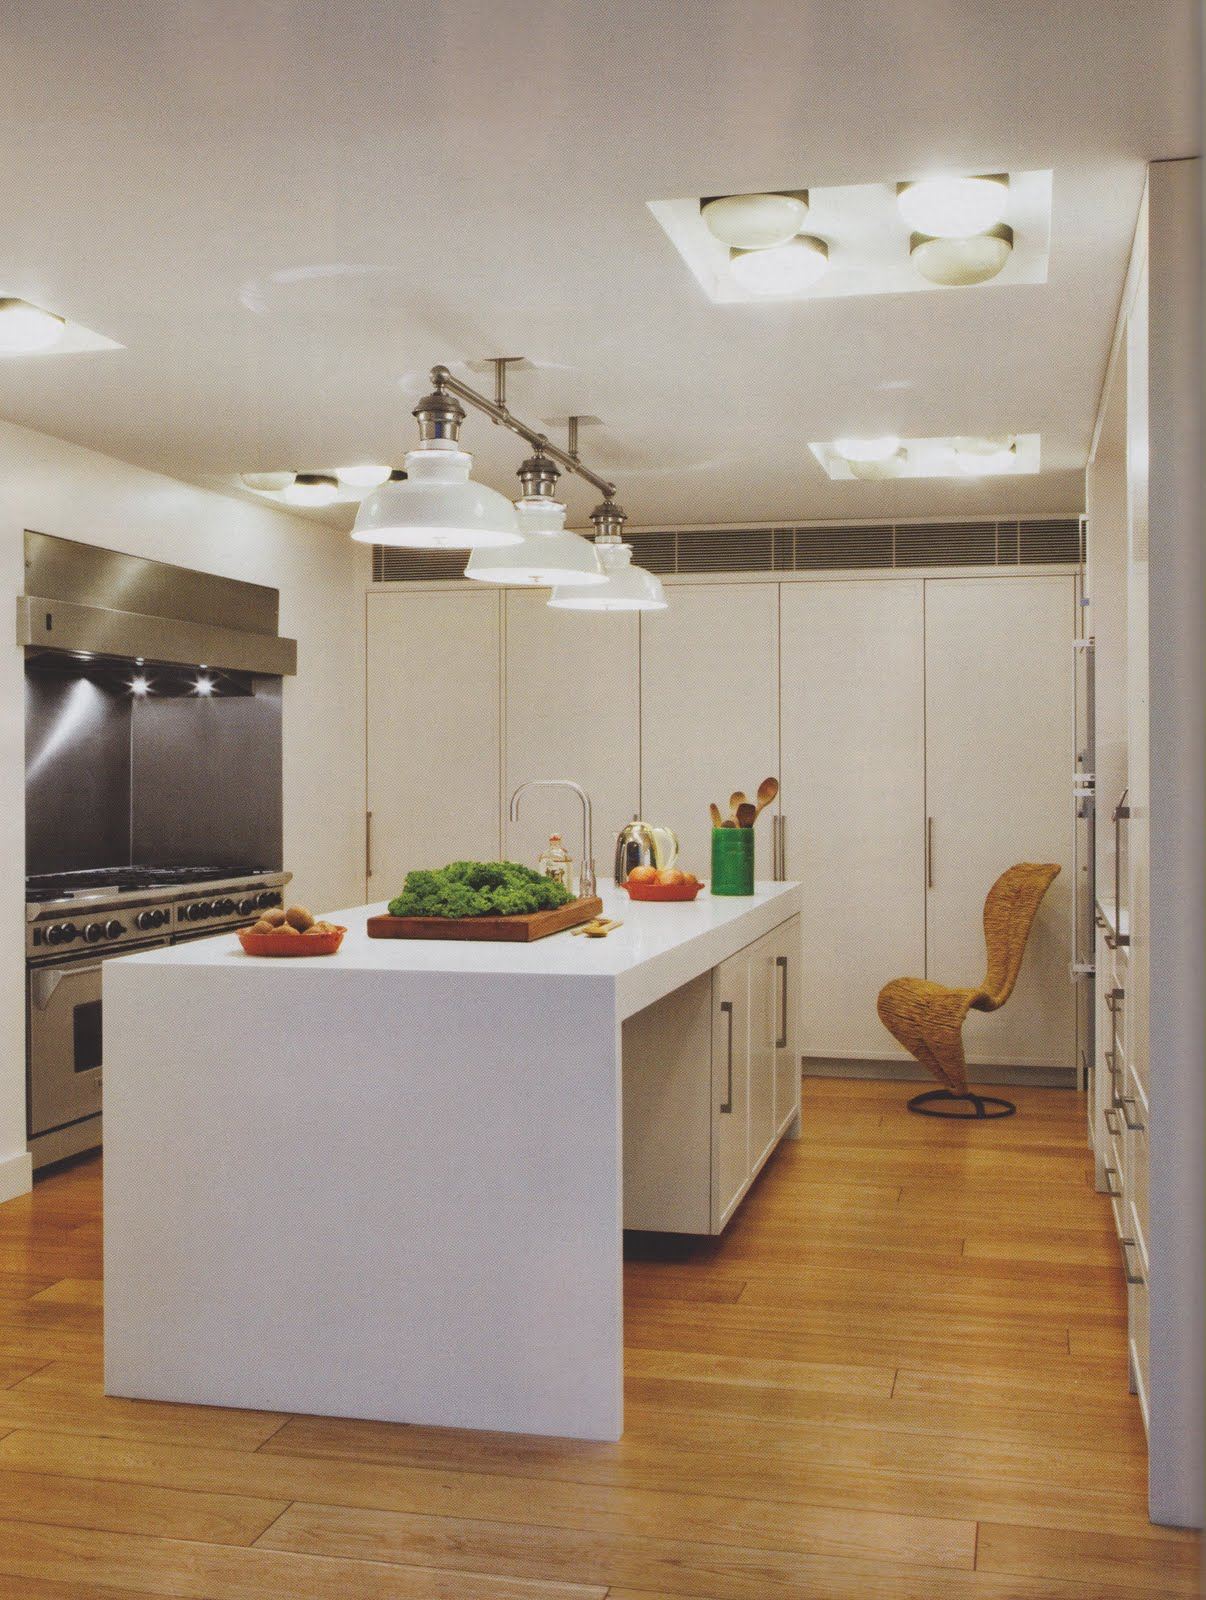 http://4.bp.blogspot.com/_ZEfZ1e604OA/S-CMYFPhYII/AAAAAAAABMQ/jbXjIWaeqCY/s1600/sting+ad05.10+kitchen.jpg